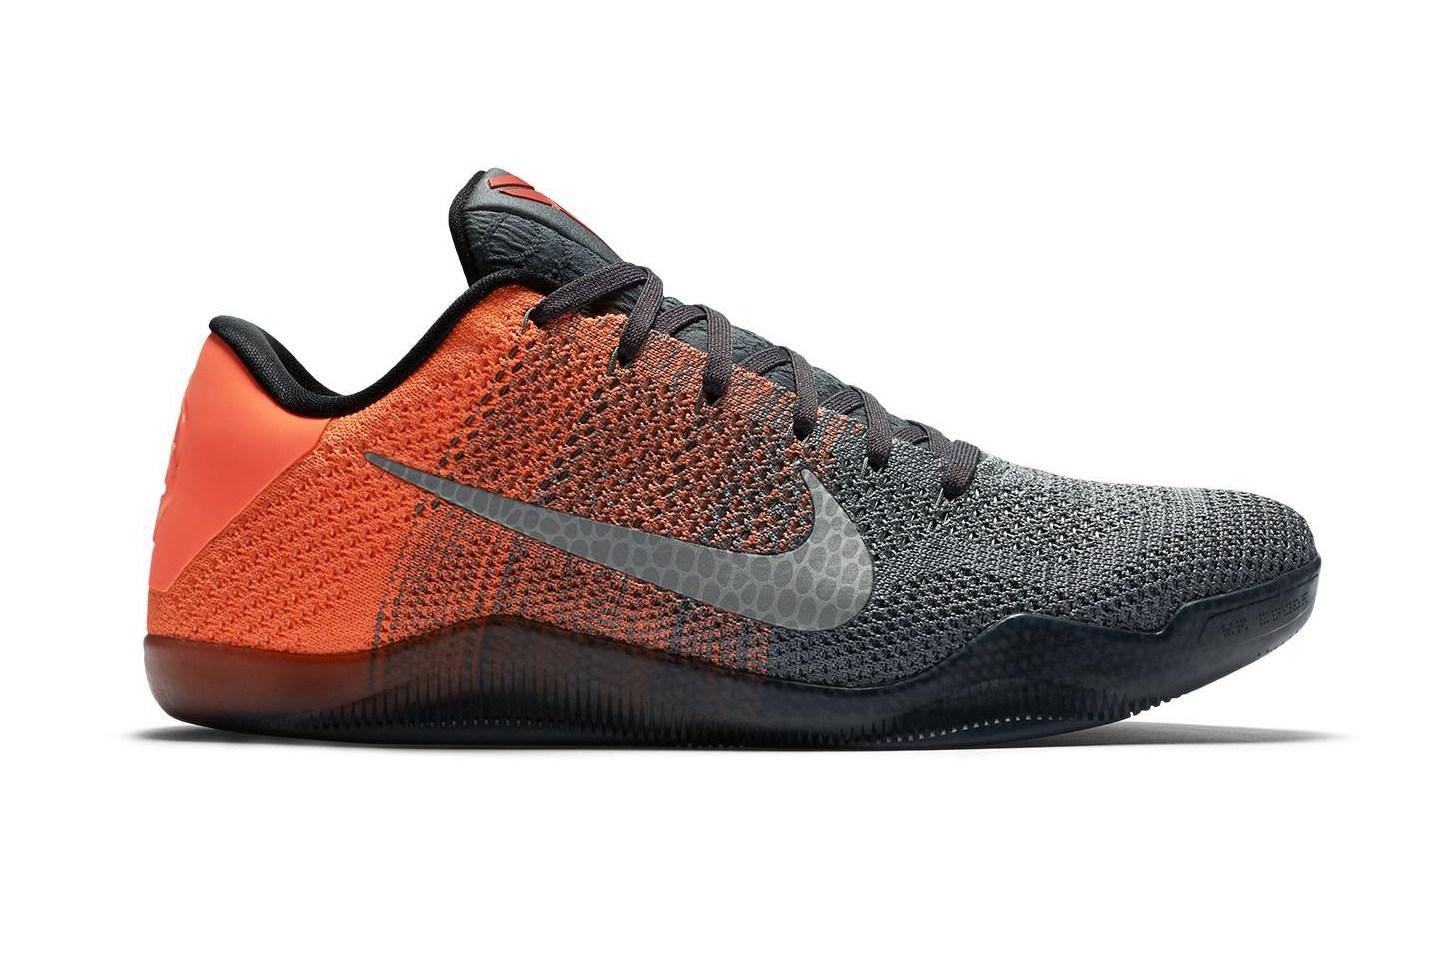 Take a Look at the Nike Kobe 11 'Easter' -6